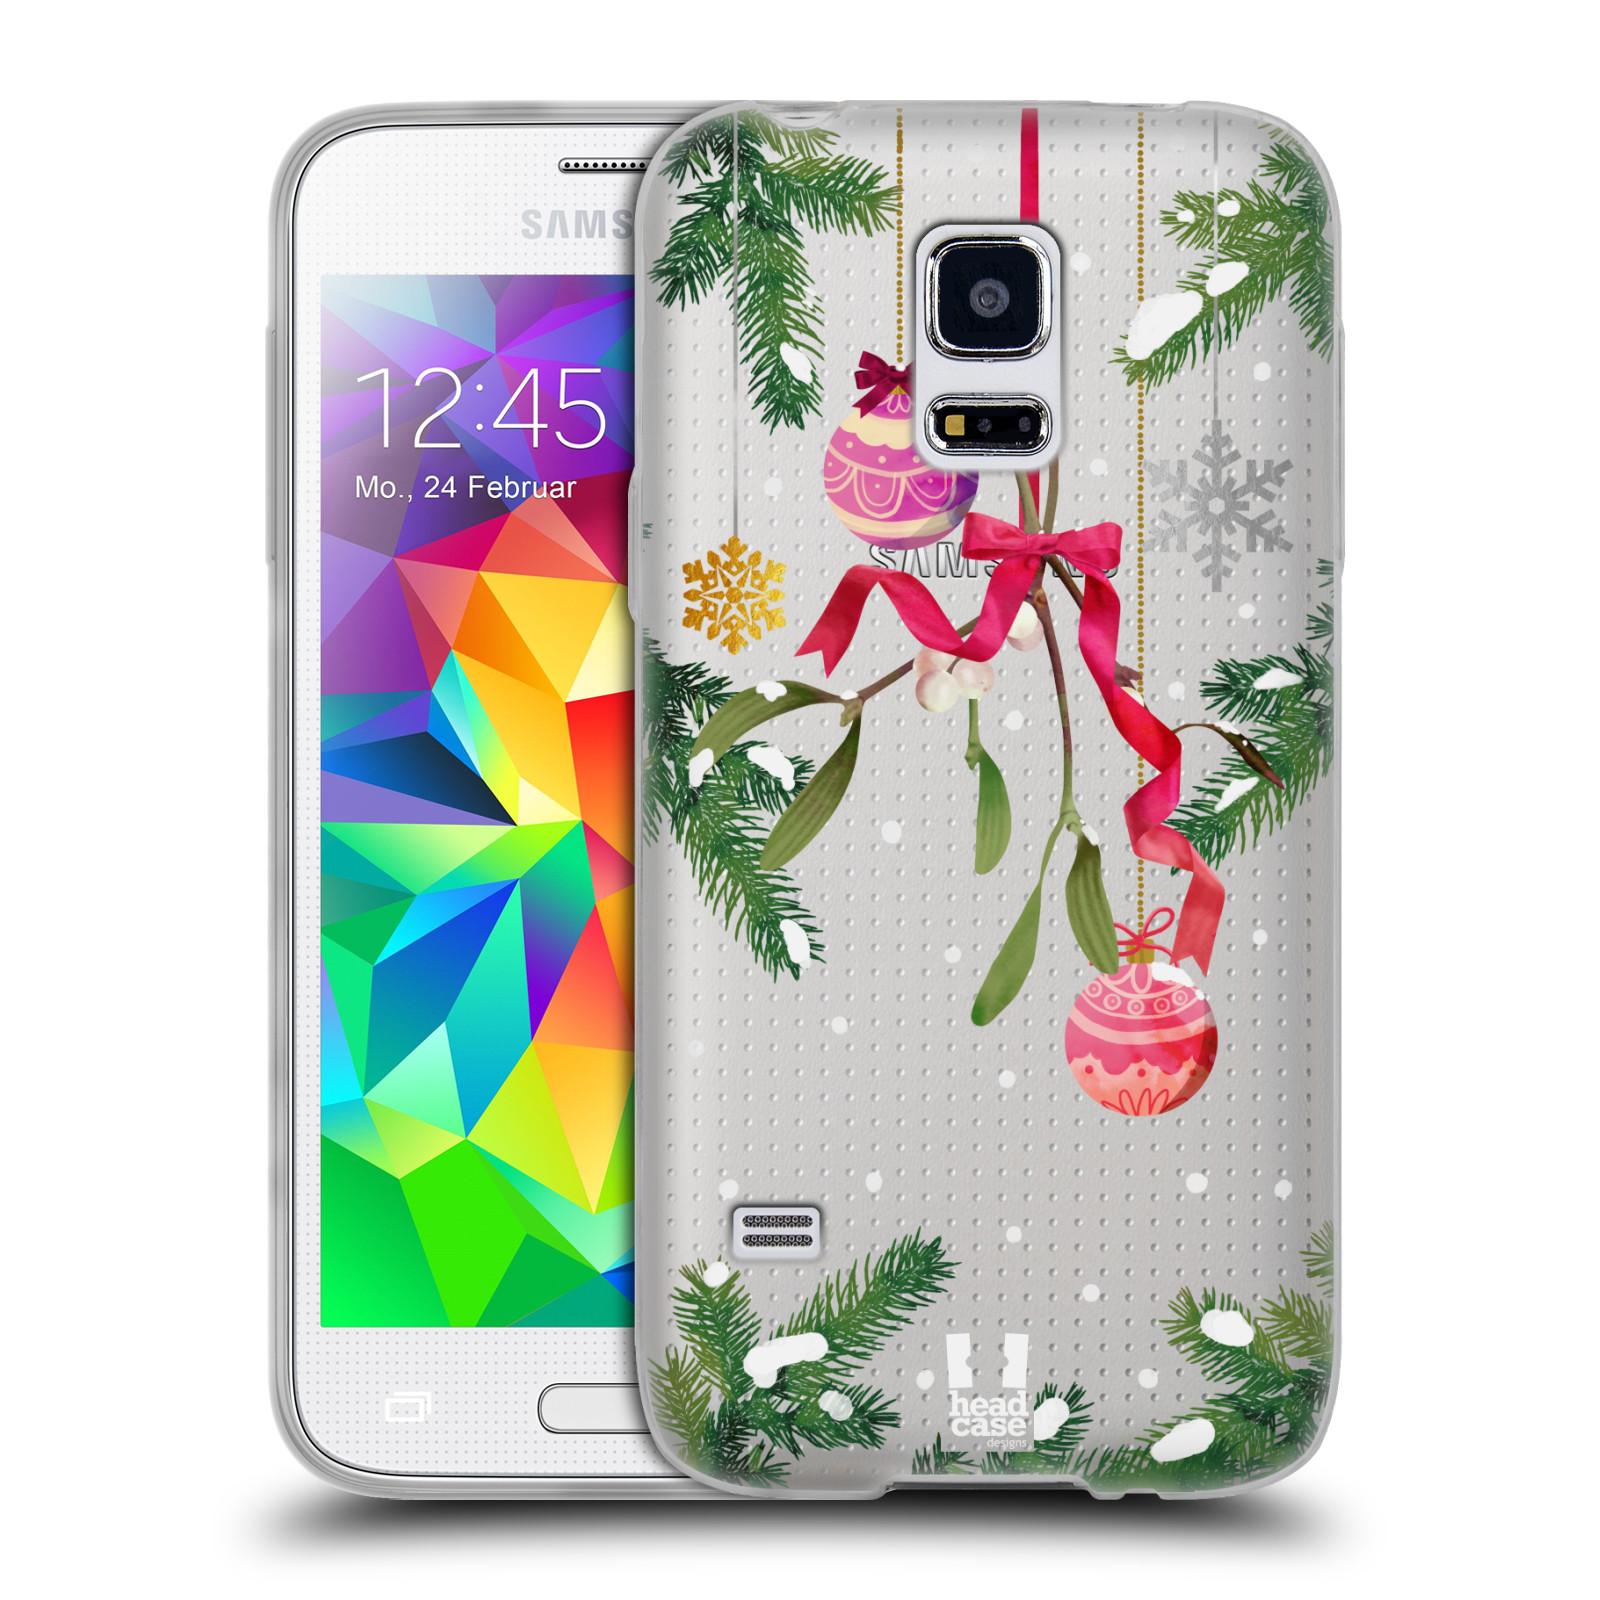 Silikonové pouzdro na mobil Samsung Galaxy S5 Mini - Head Case - Větvičky a vánoční ozdoby